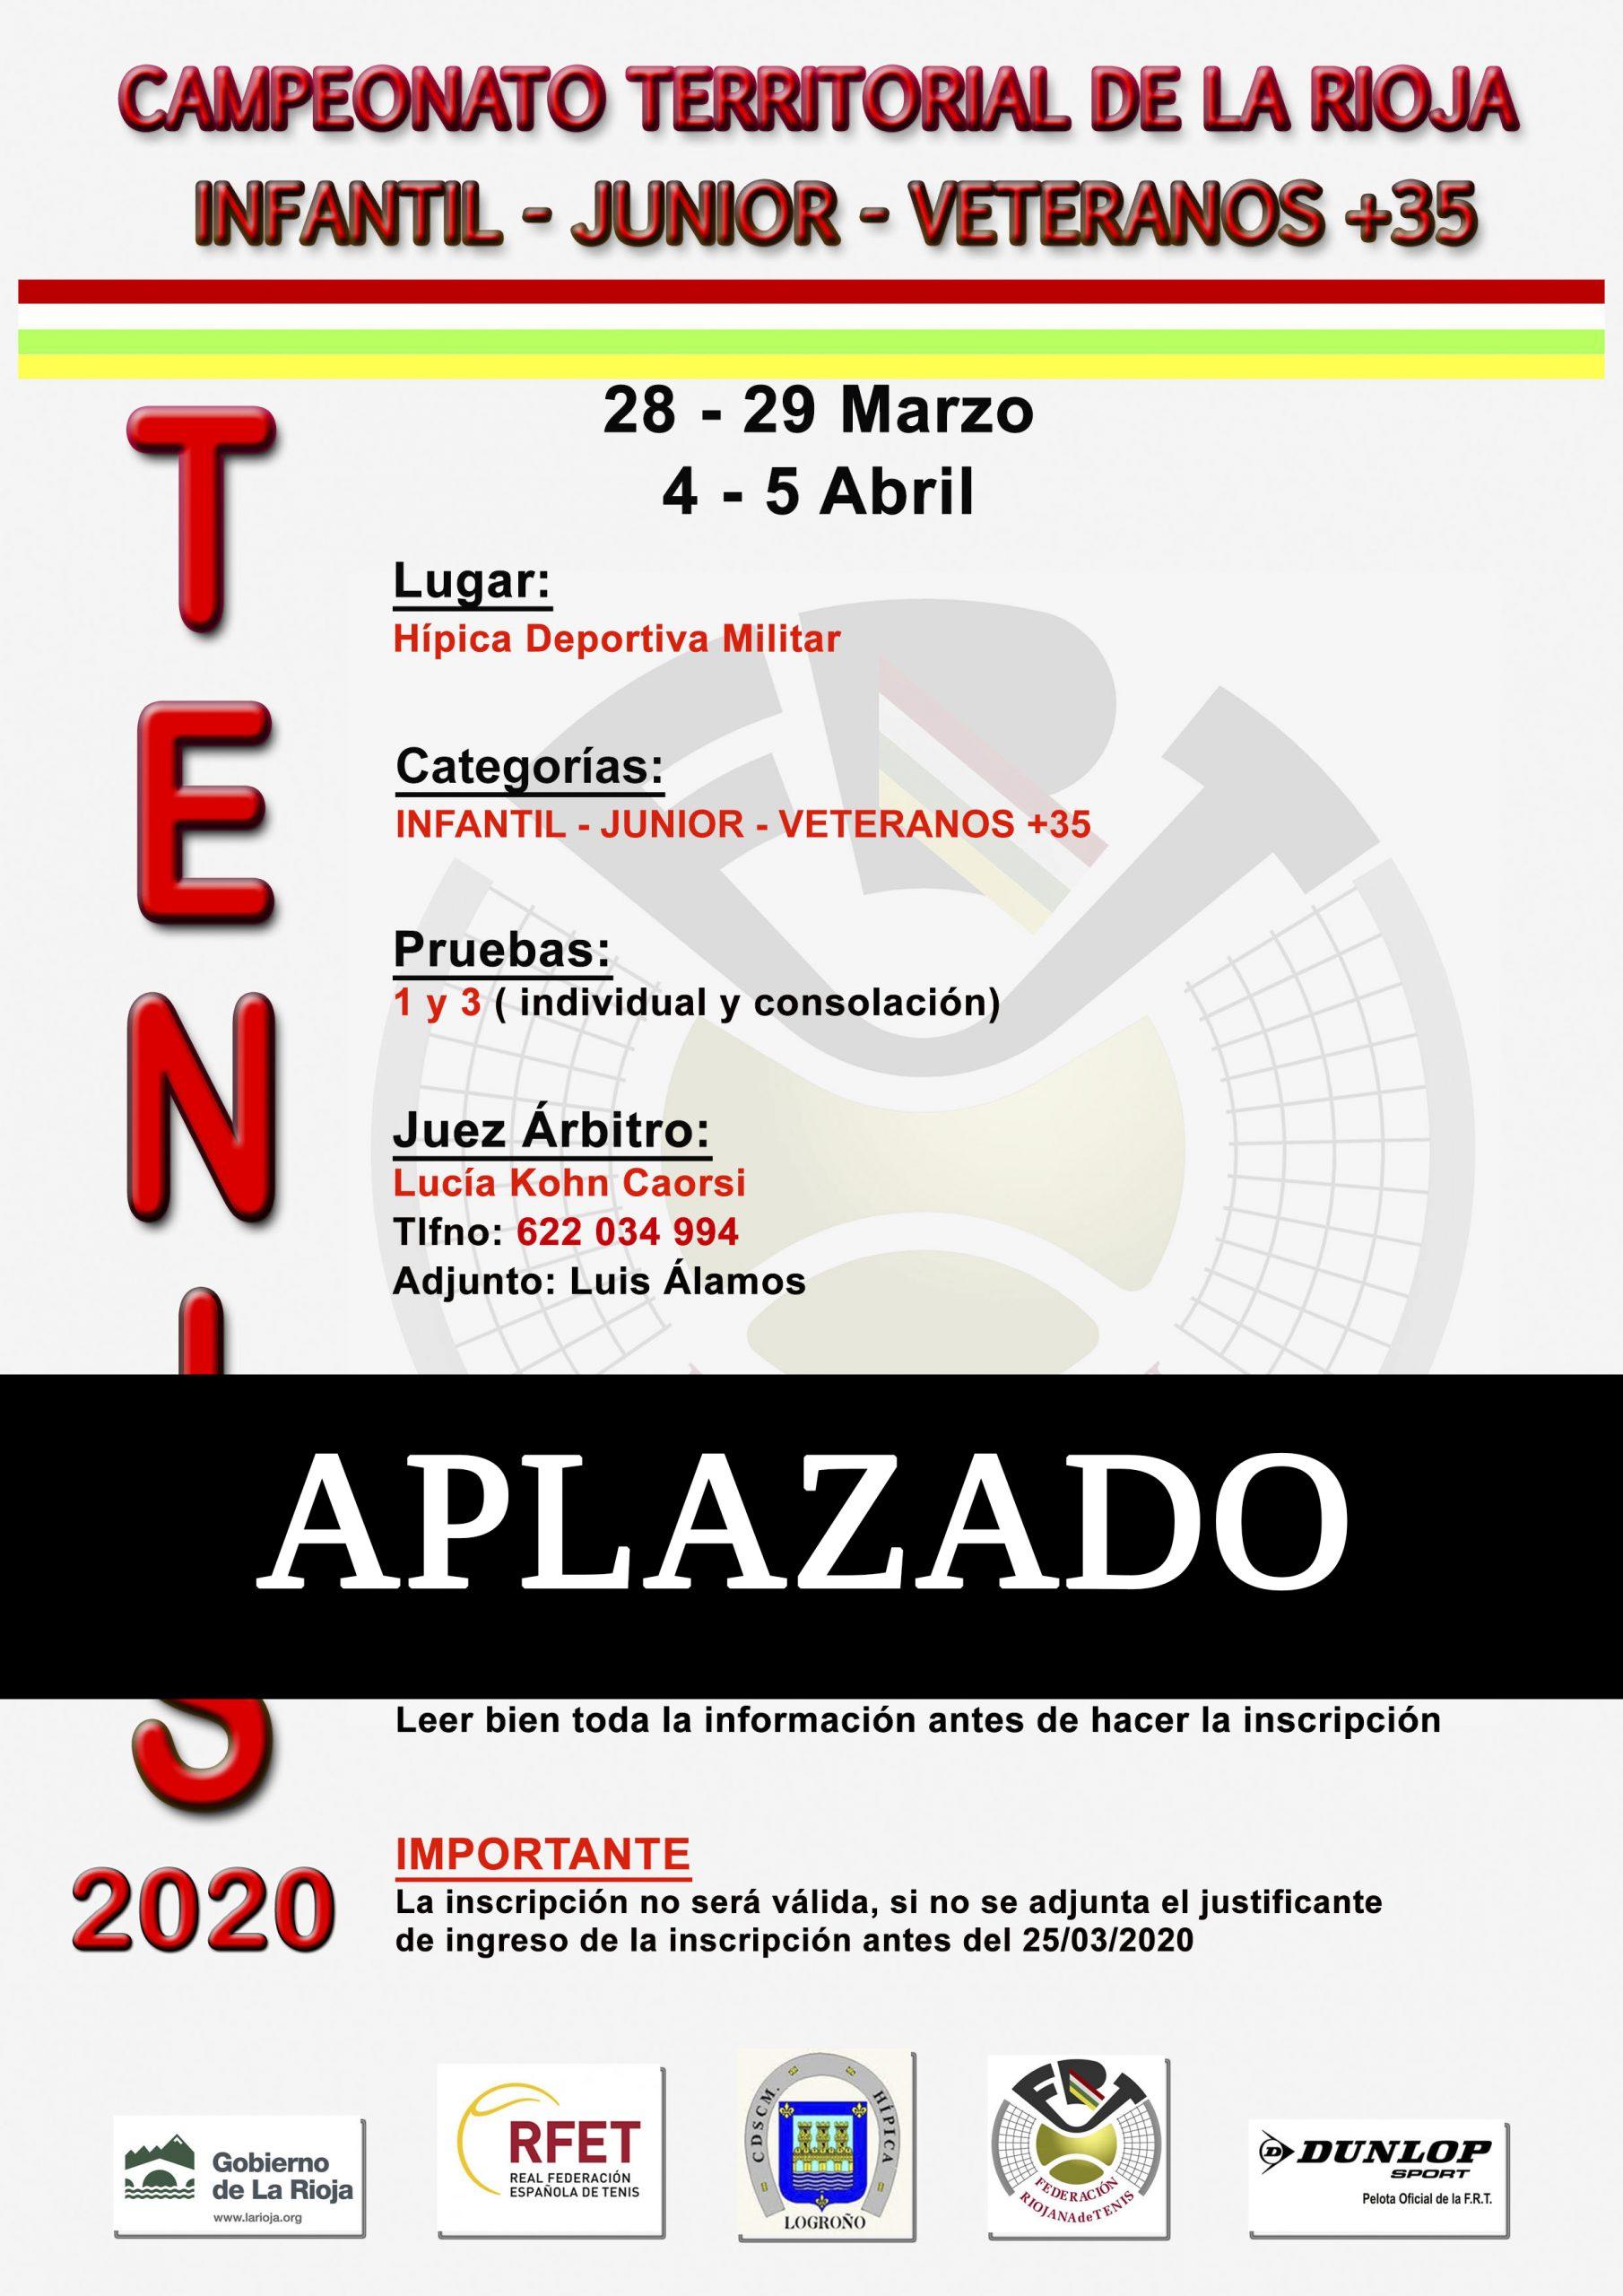 Campeonato Territorial de La Rioja Infantil-Junior-Veteranos+35